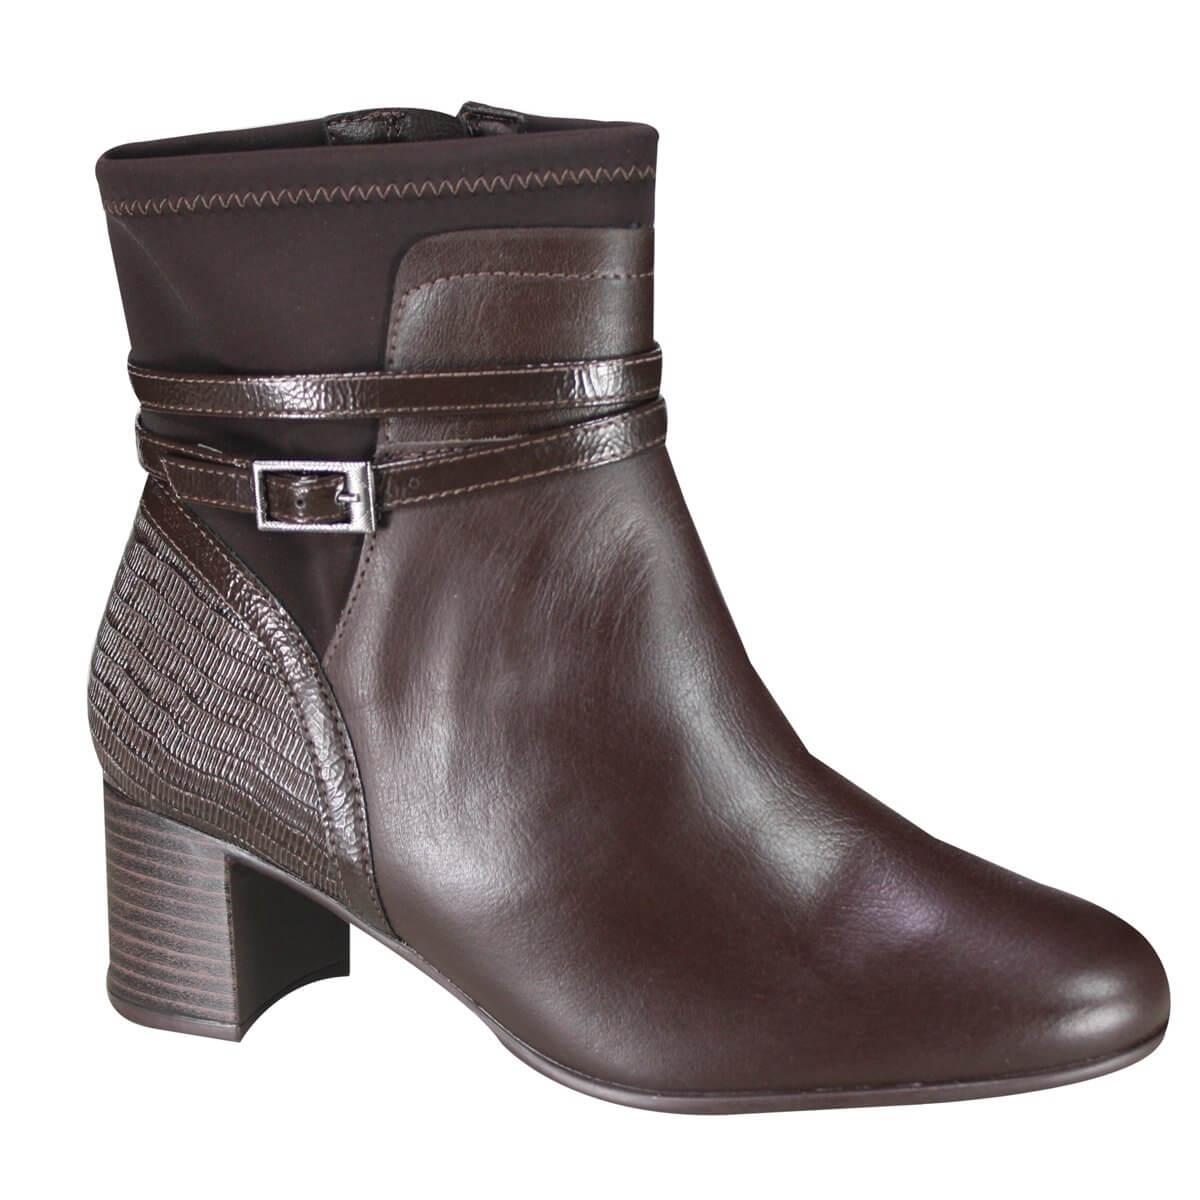 3a29ce658 Bota Comfortflex Feminina Ankle Boot 19-99303 000001 - Cafe ...